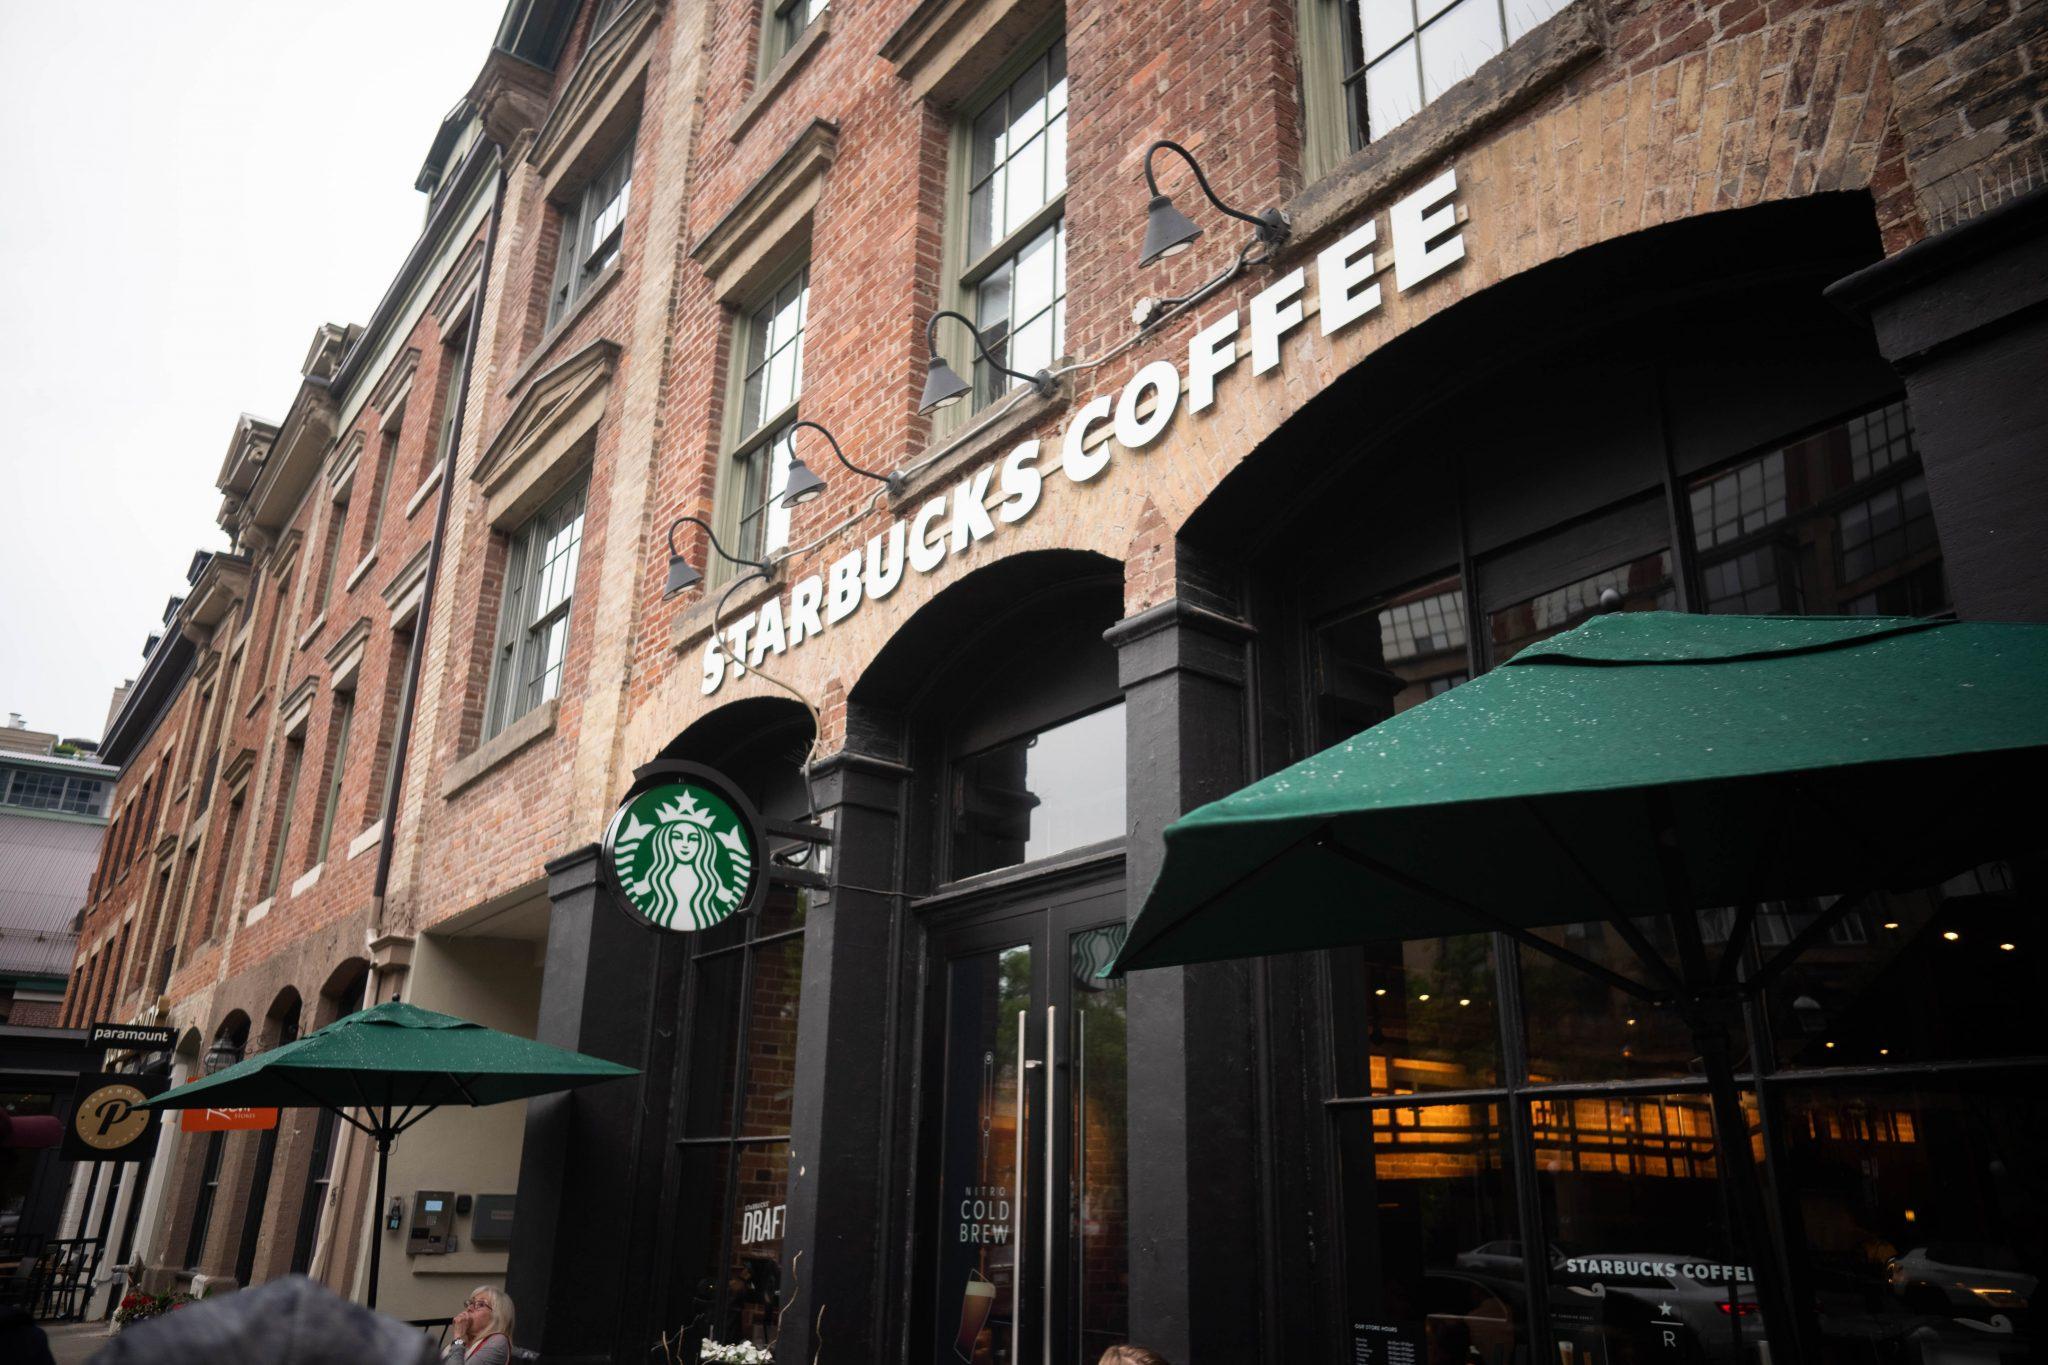 Starbucks in Child Labour Row